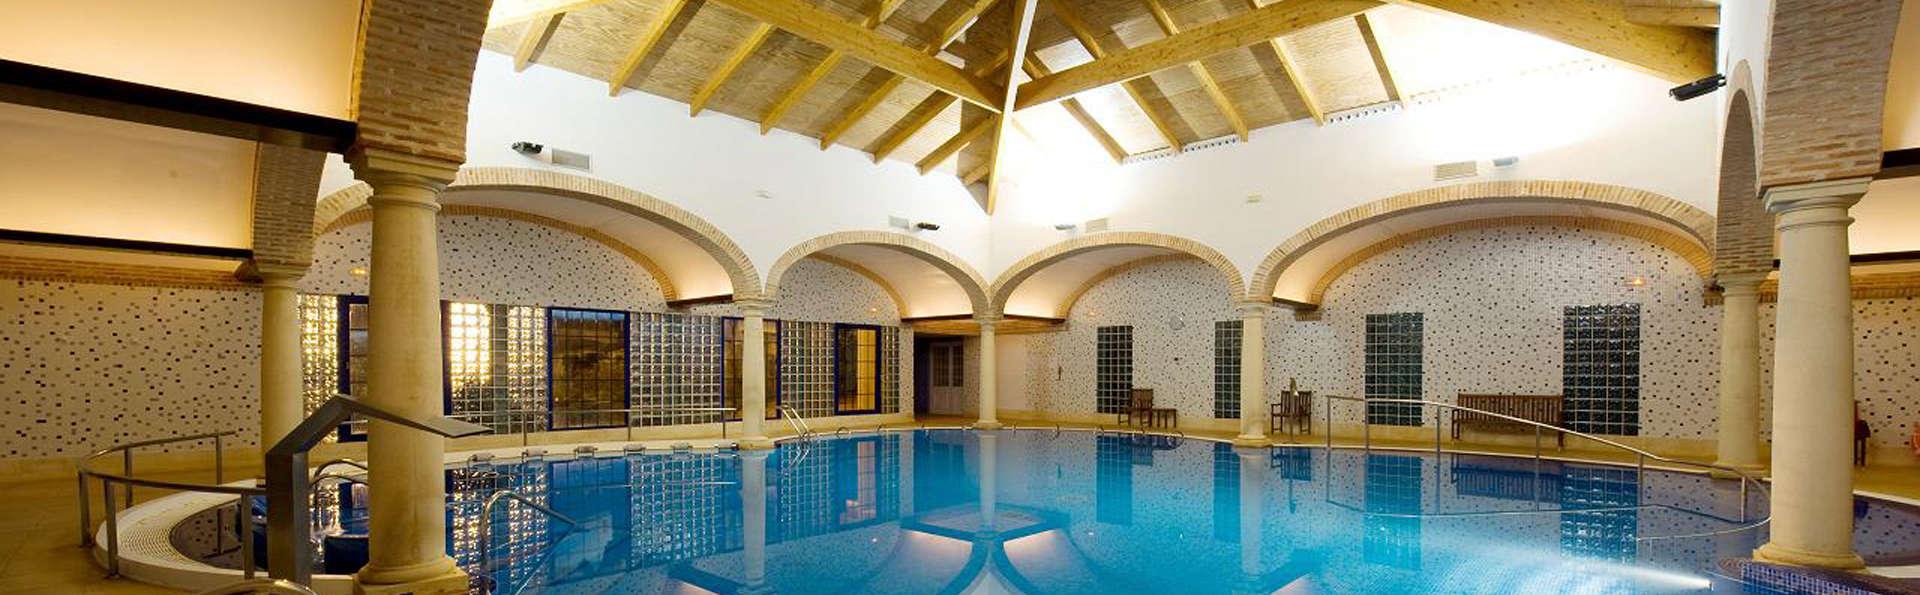 Hotel Balneario Cervantes - edit_pool1.jpg